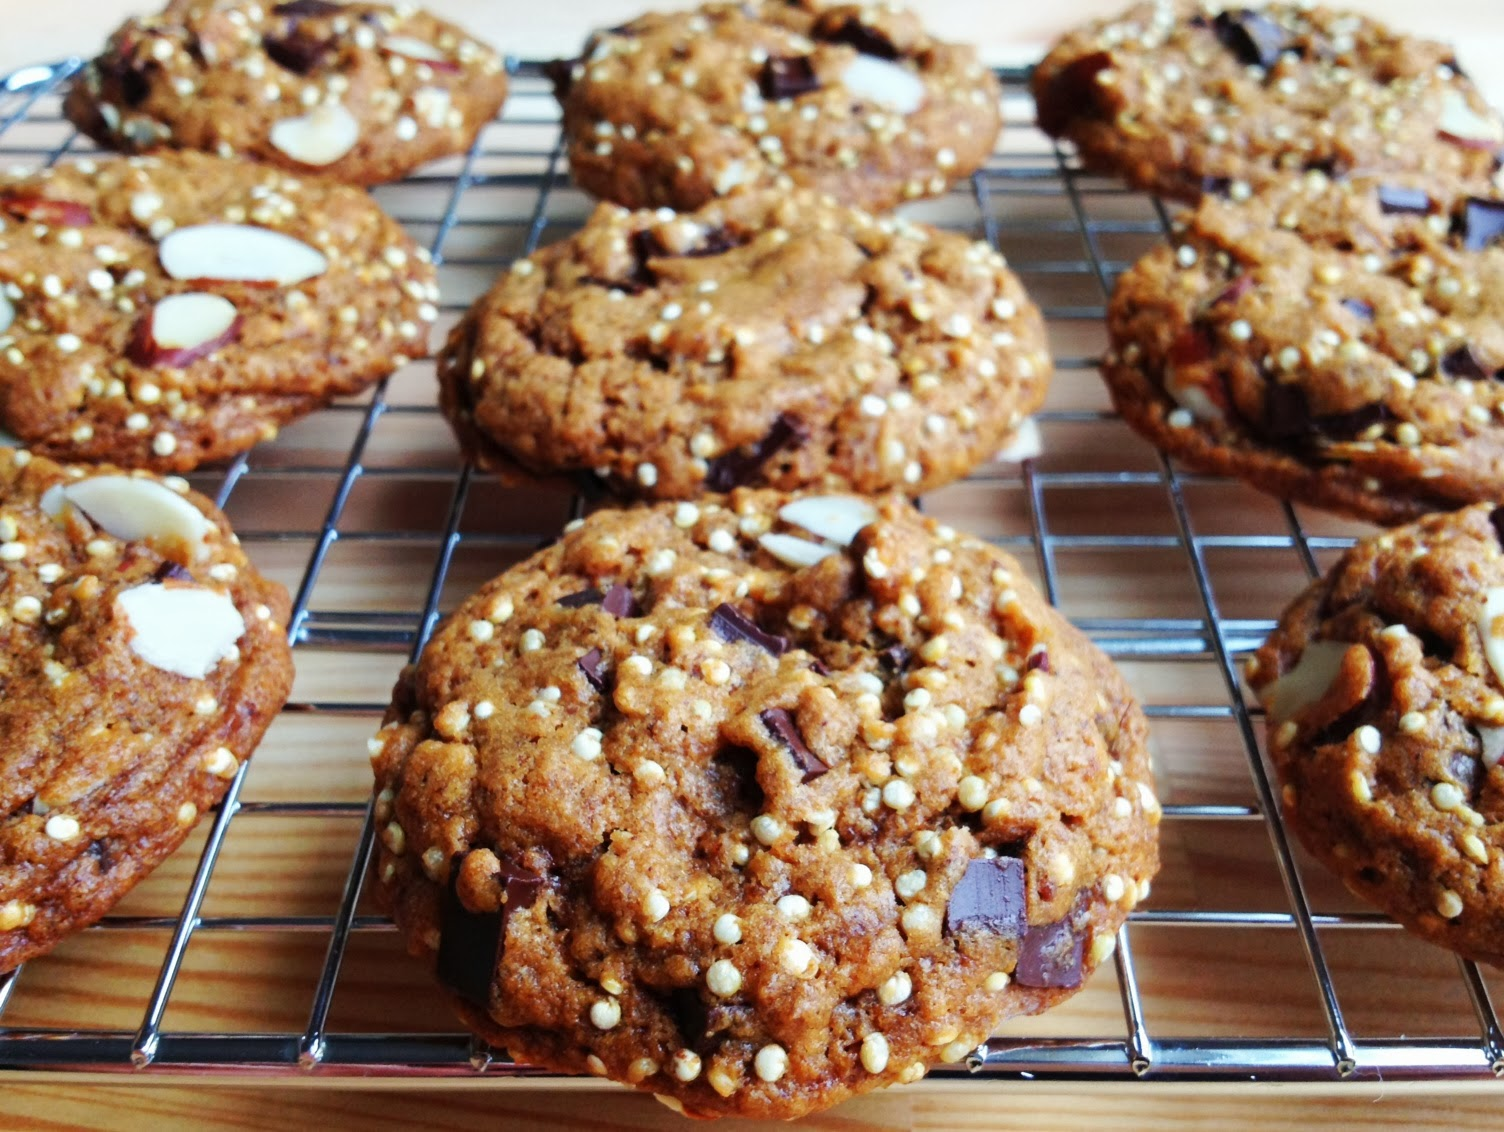 ... : VeganMoFo 6: Chocolate Chip Espresso Almond Quinoa Crunch Cookies